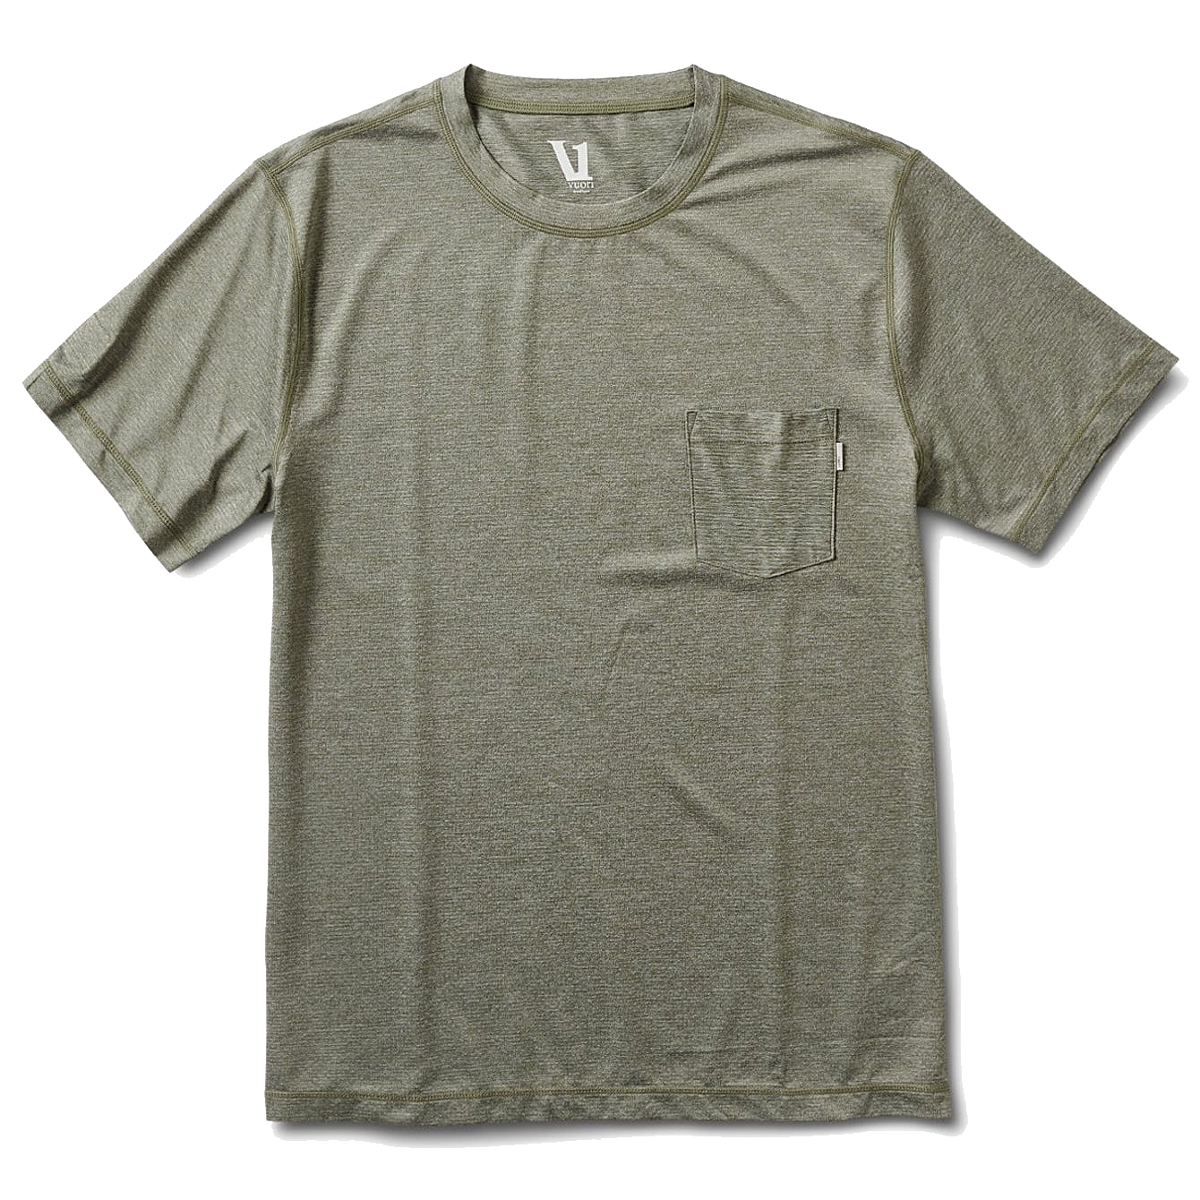 Men's Vuori Tradewind Performance Tee  - Color: Army Heather - Size: S, Army Heather, large, image 1